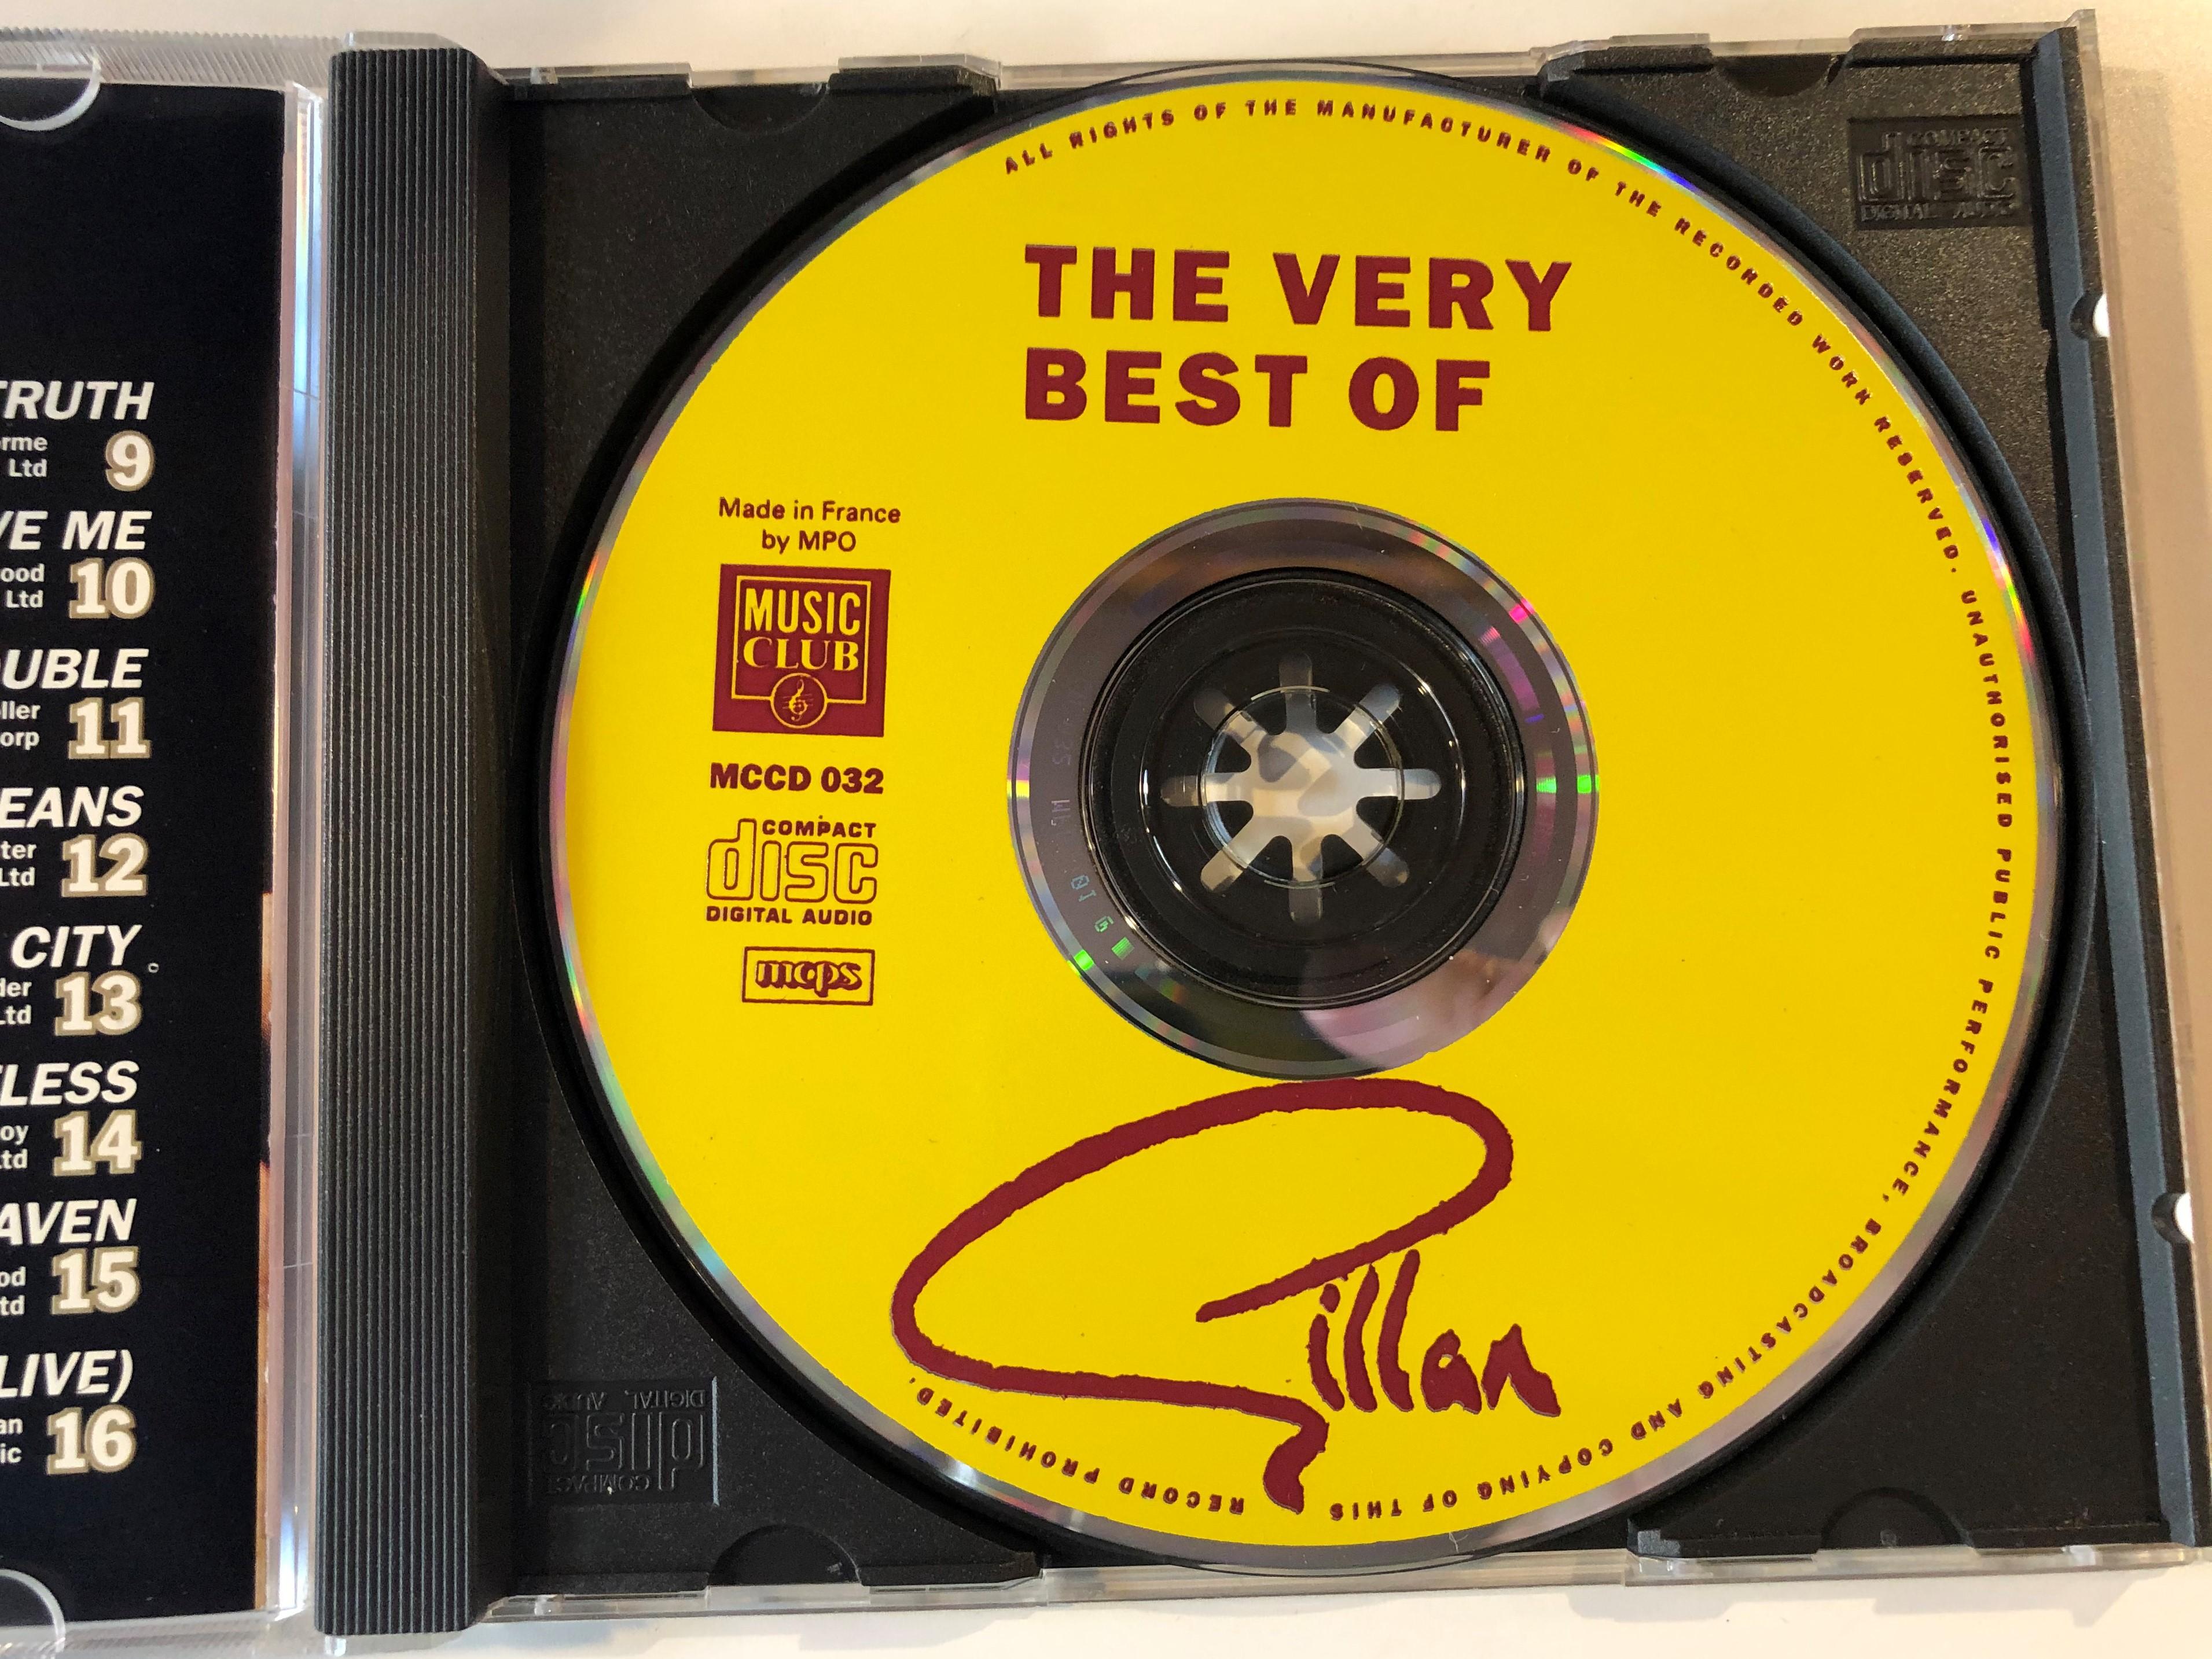 the-very-best-of-gillan-music-club-audio-cd-1991-mccd-032-2-.jpg